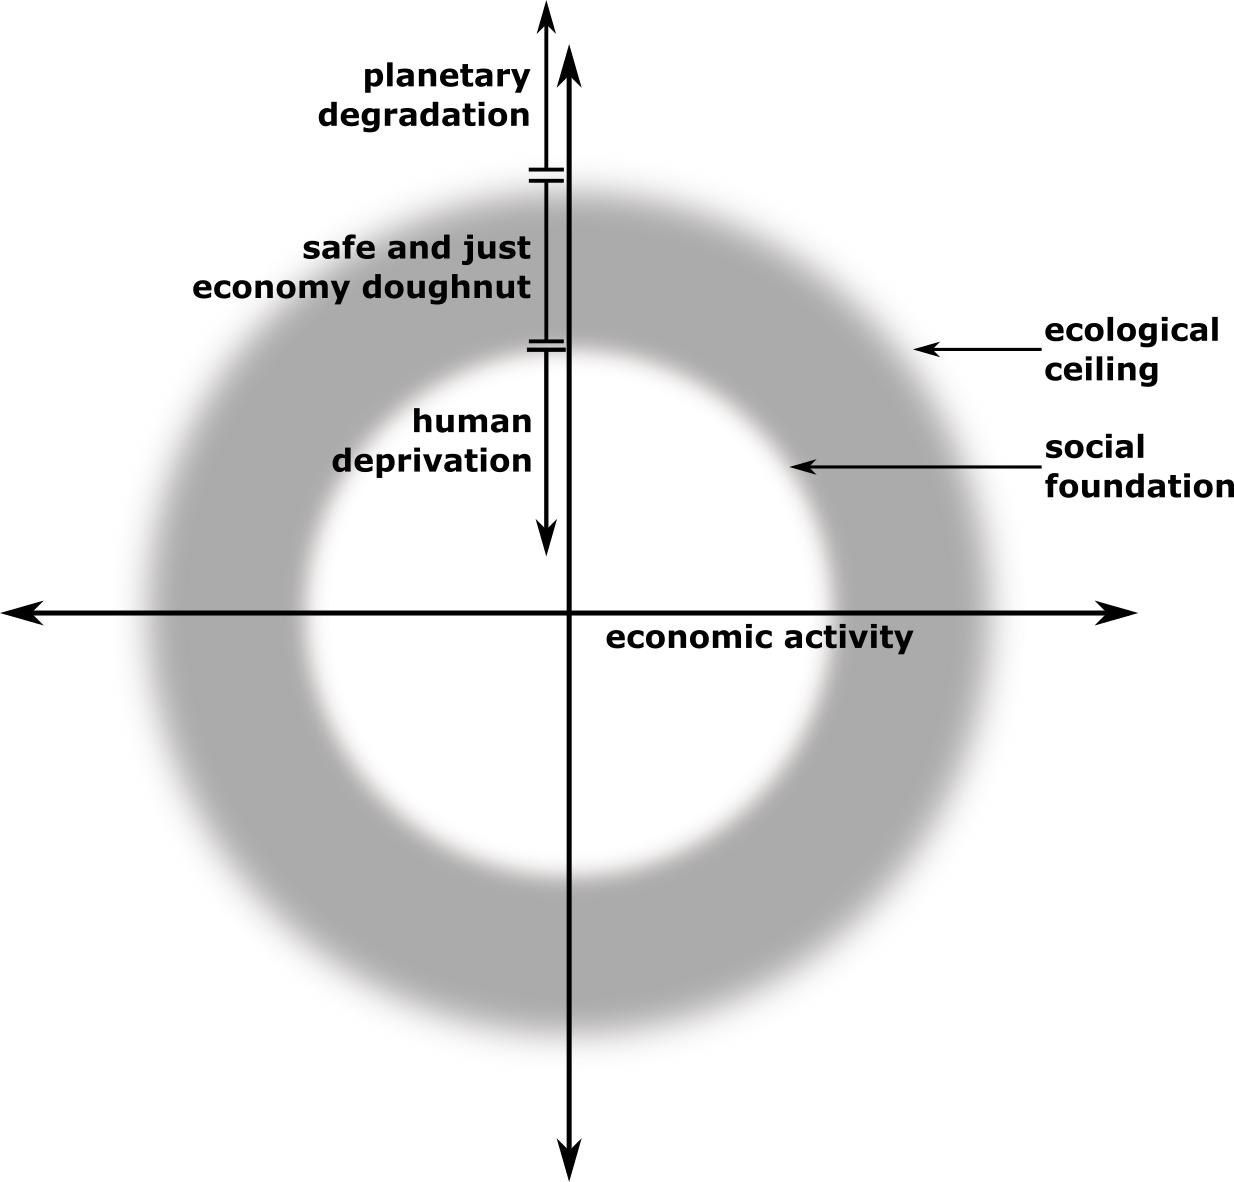 Doughnut Economics by Kate Raworth: The Doughnut